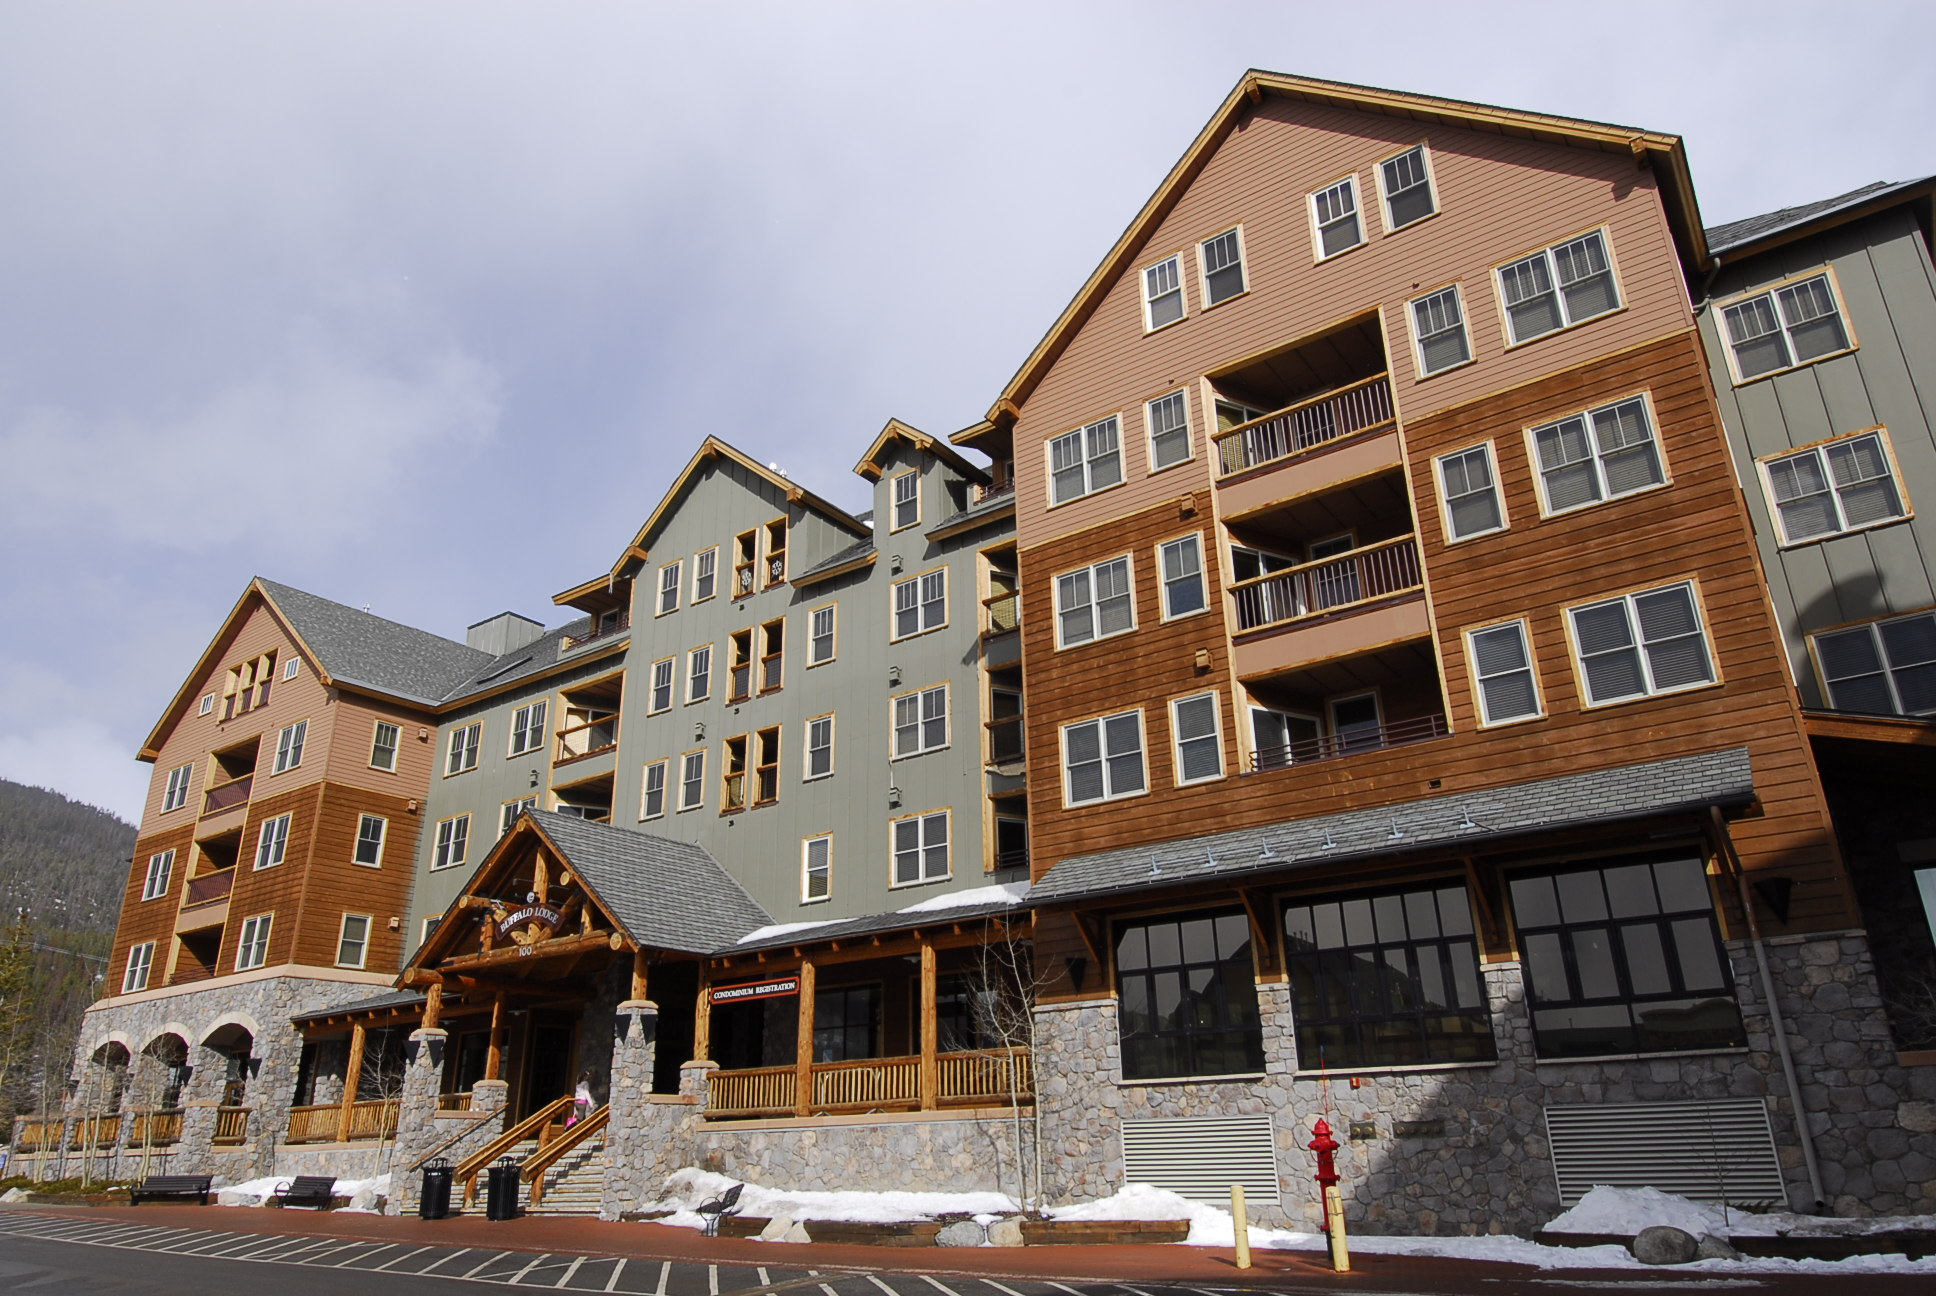 13 still Buffalo Lodge and the Dakota Condos Keystone Real Estate